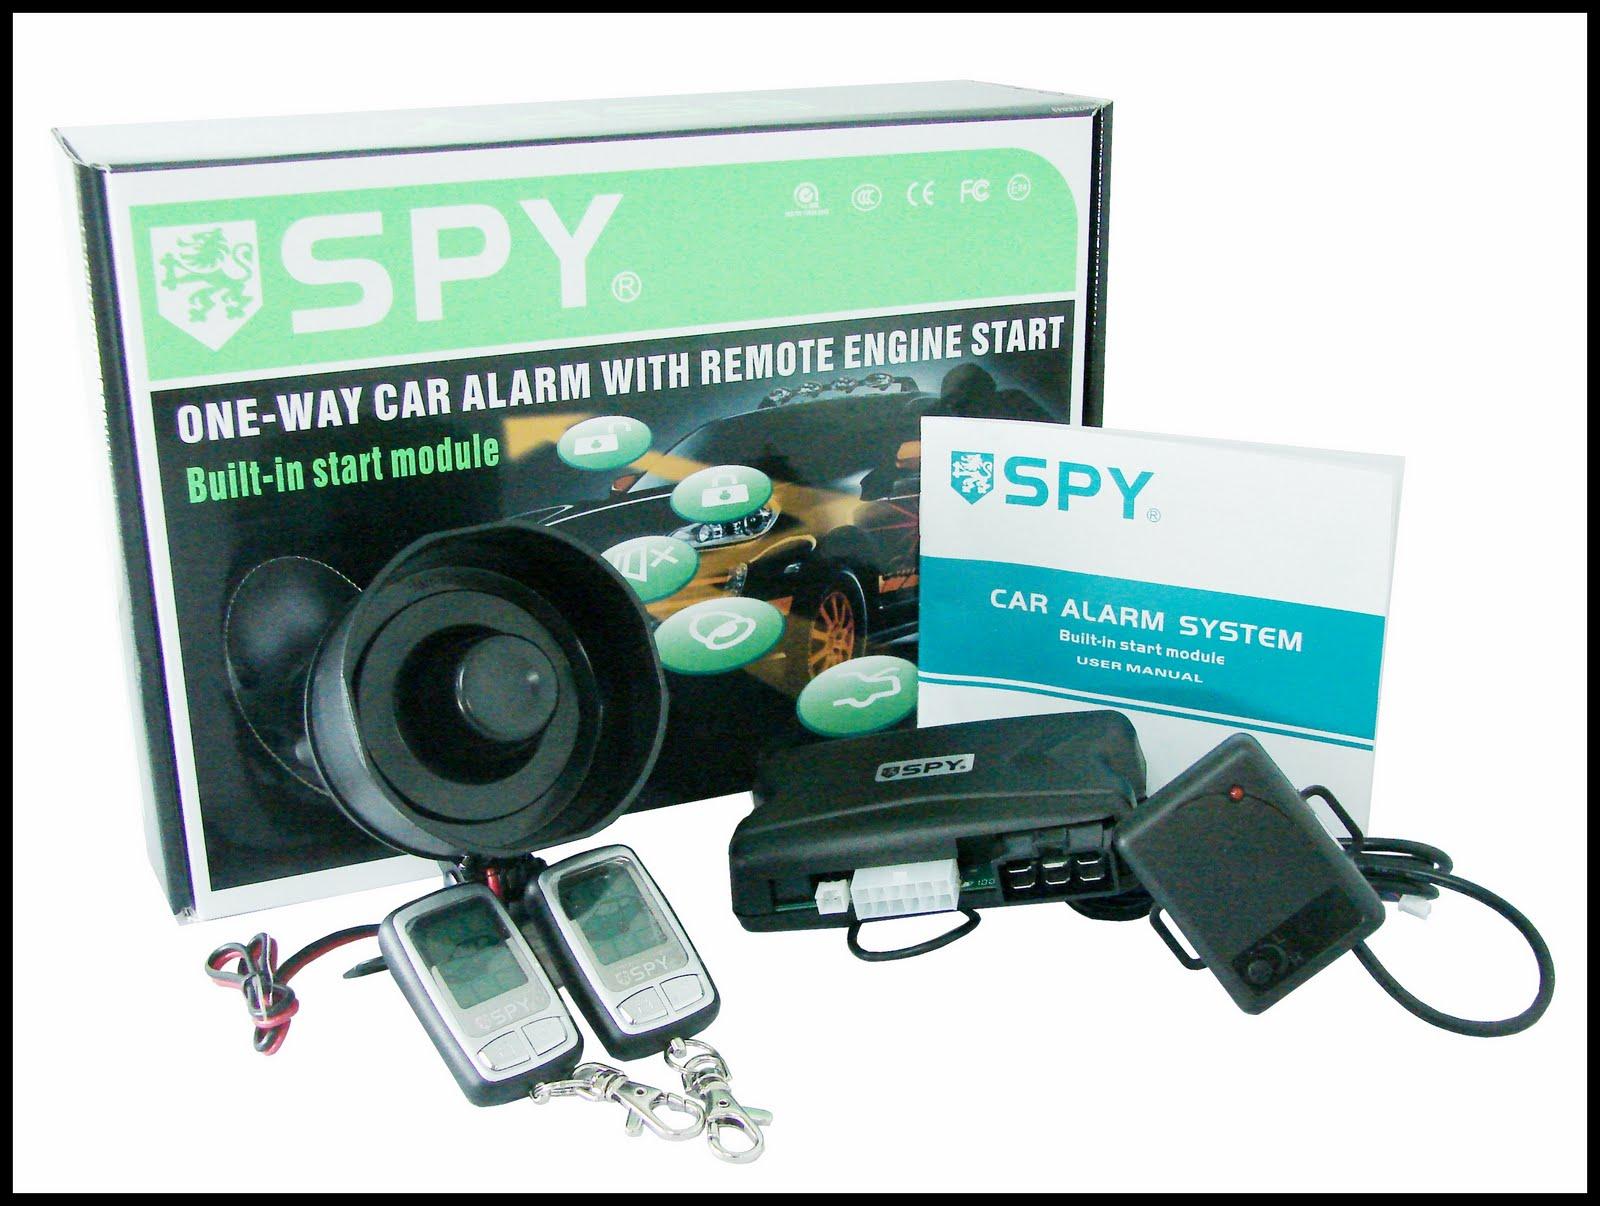 Viper Alarm 350 Wiring Diagram Vauxhall Astra Twintop Car Plus Get Free